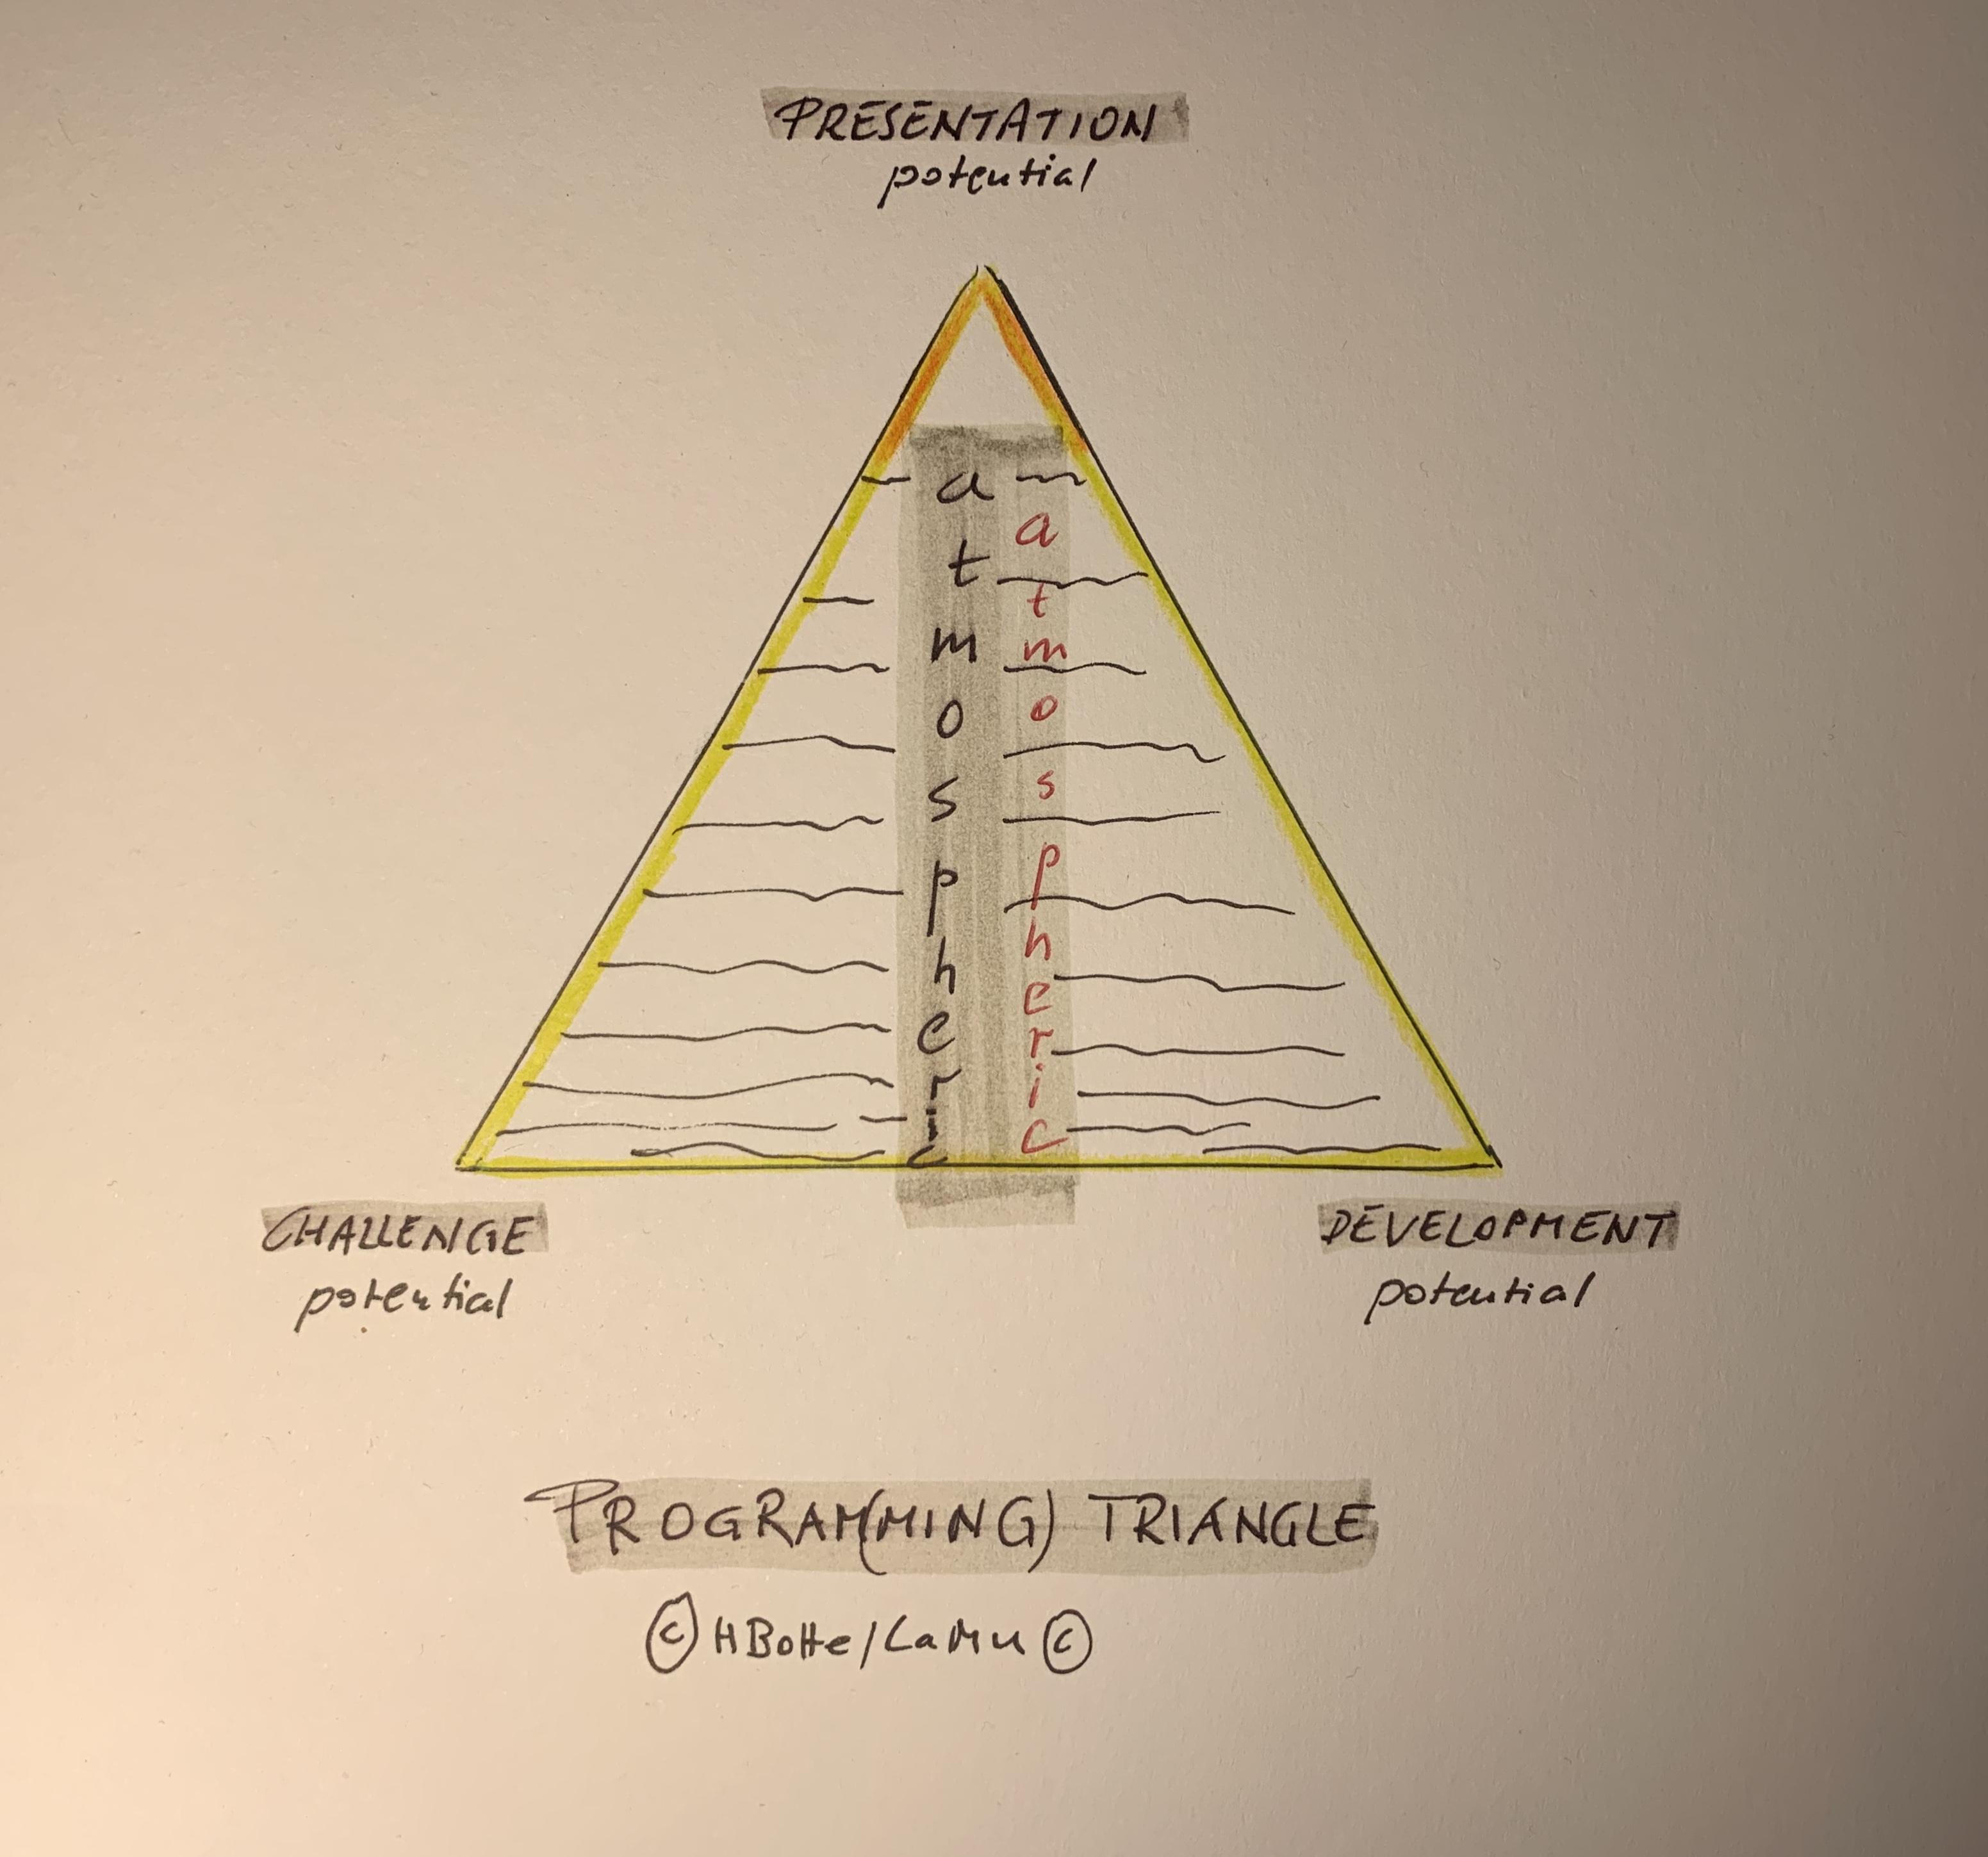 programming triangle